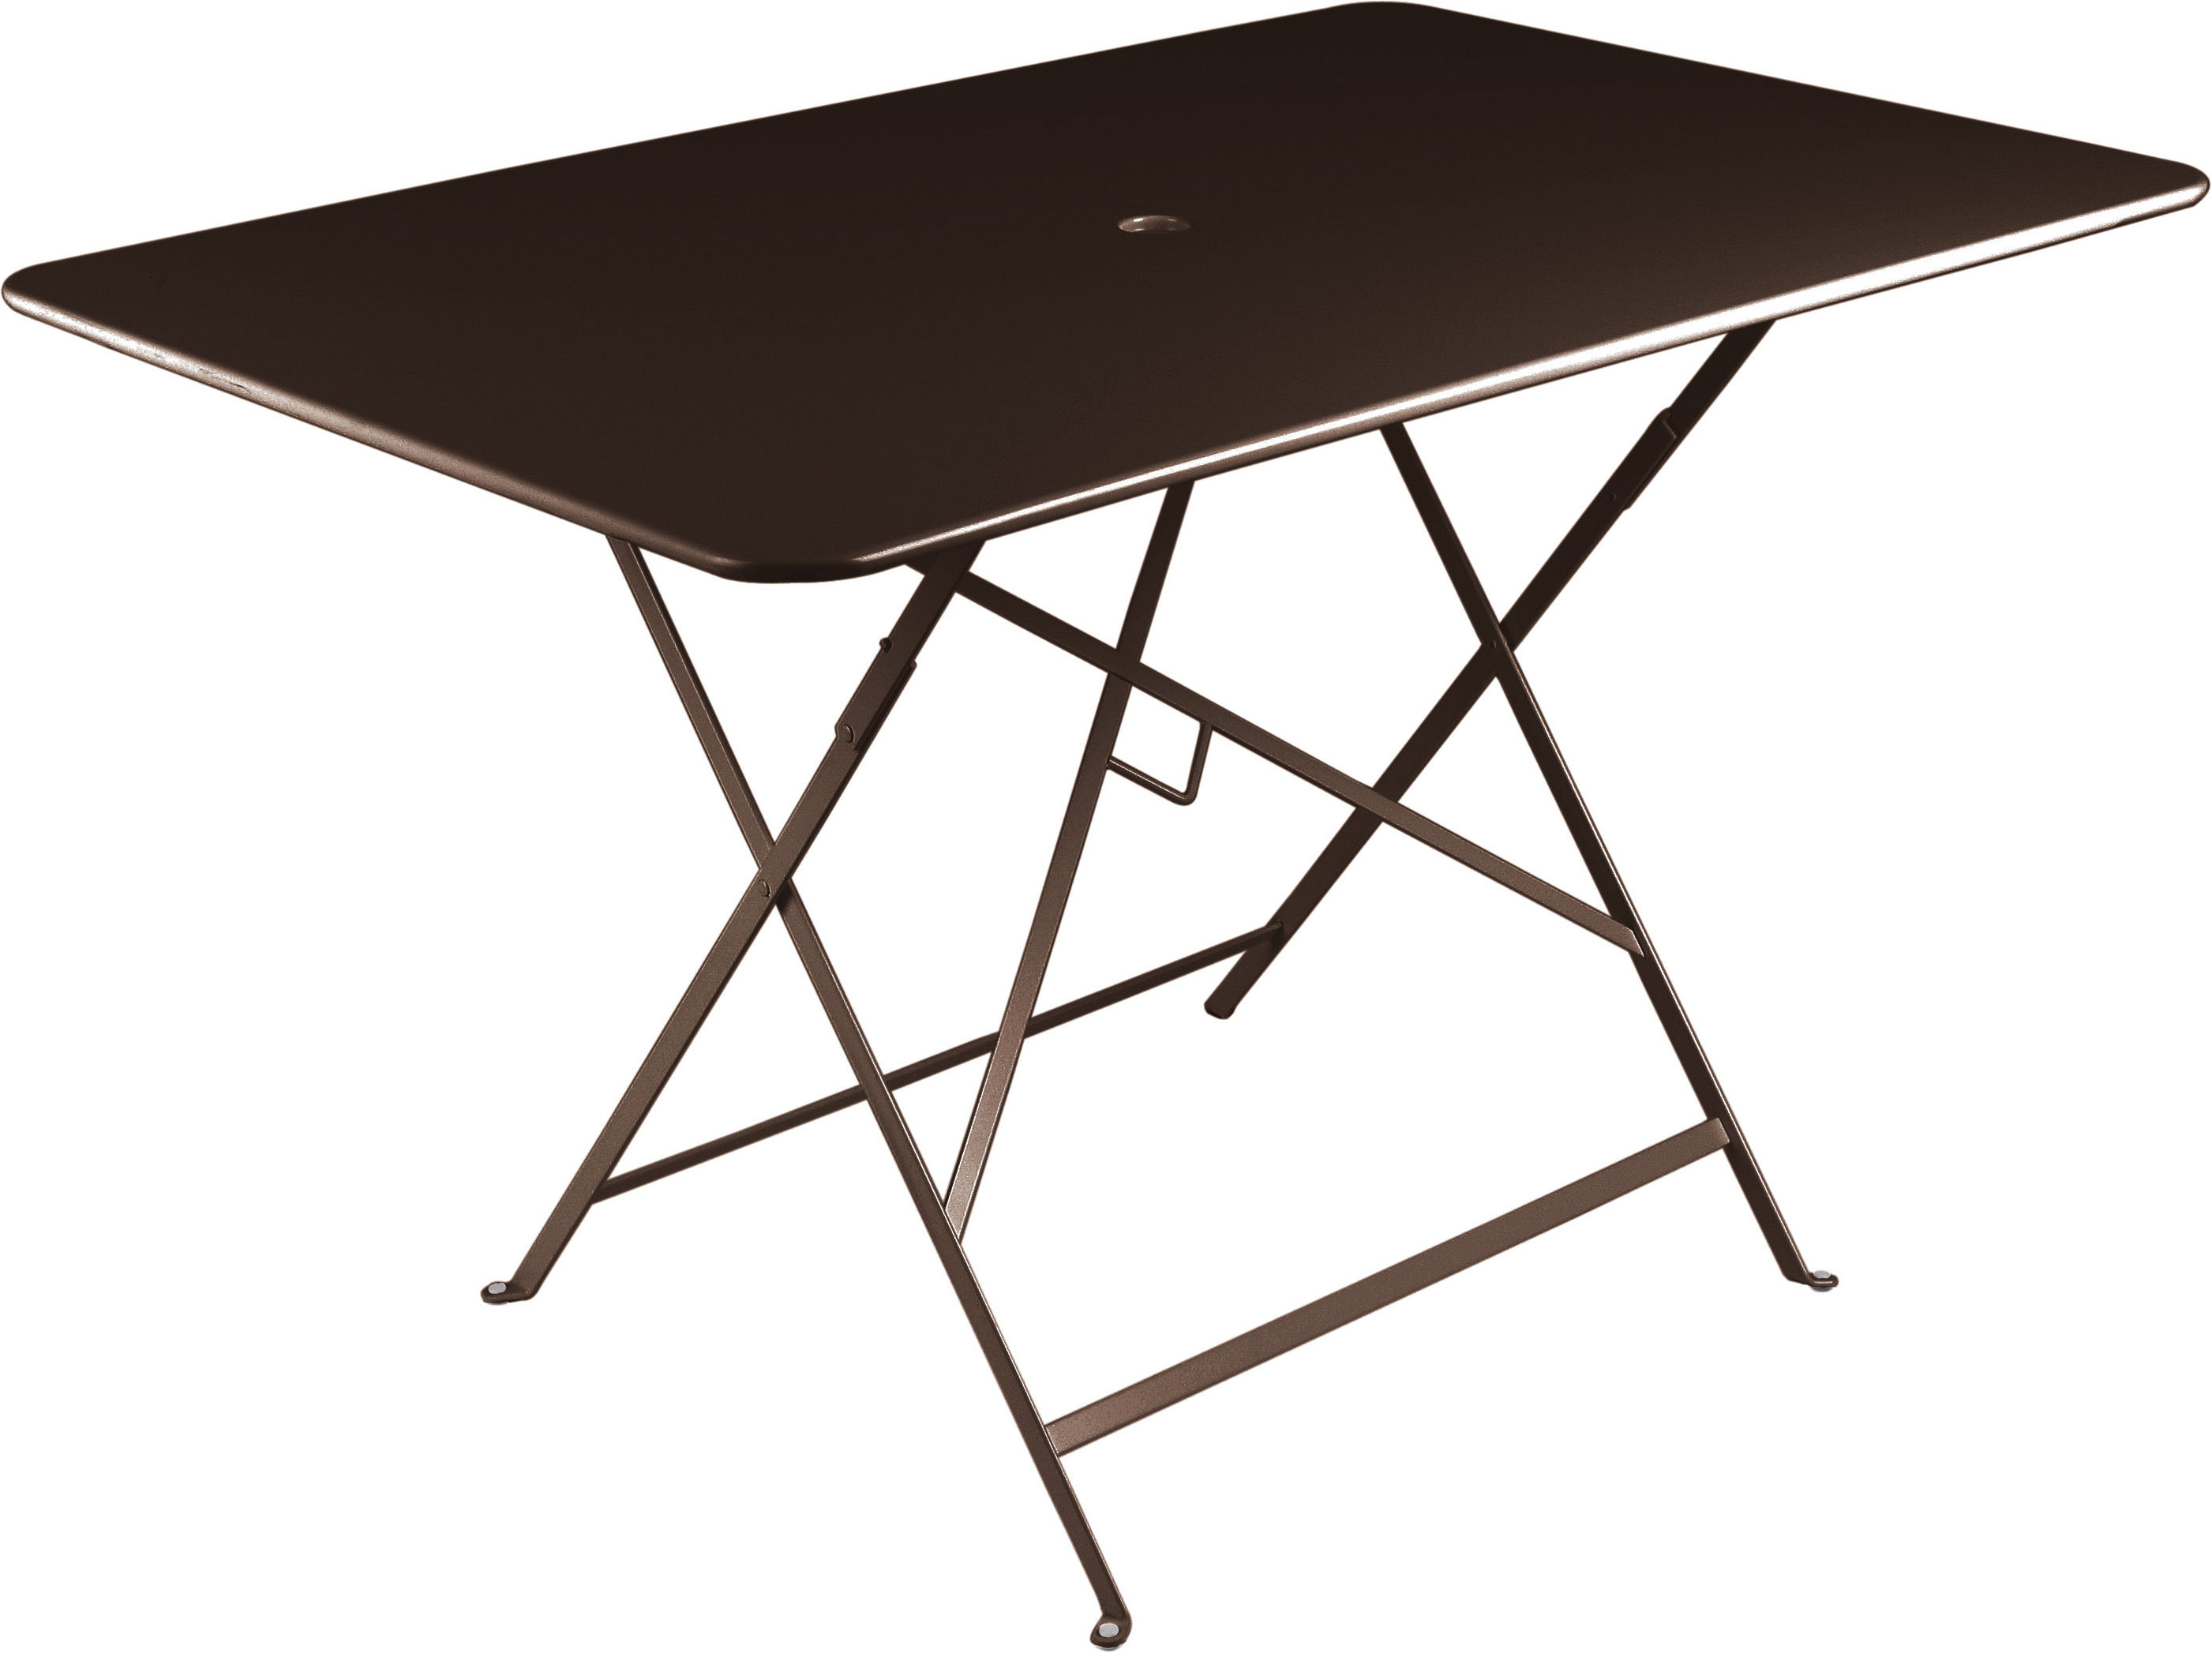 Jardin - Tables de jardin - Table pliante Bistro / 117x77cm - 6 personnes - Fermob - Rouille - Acier laqué